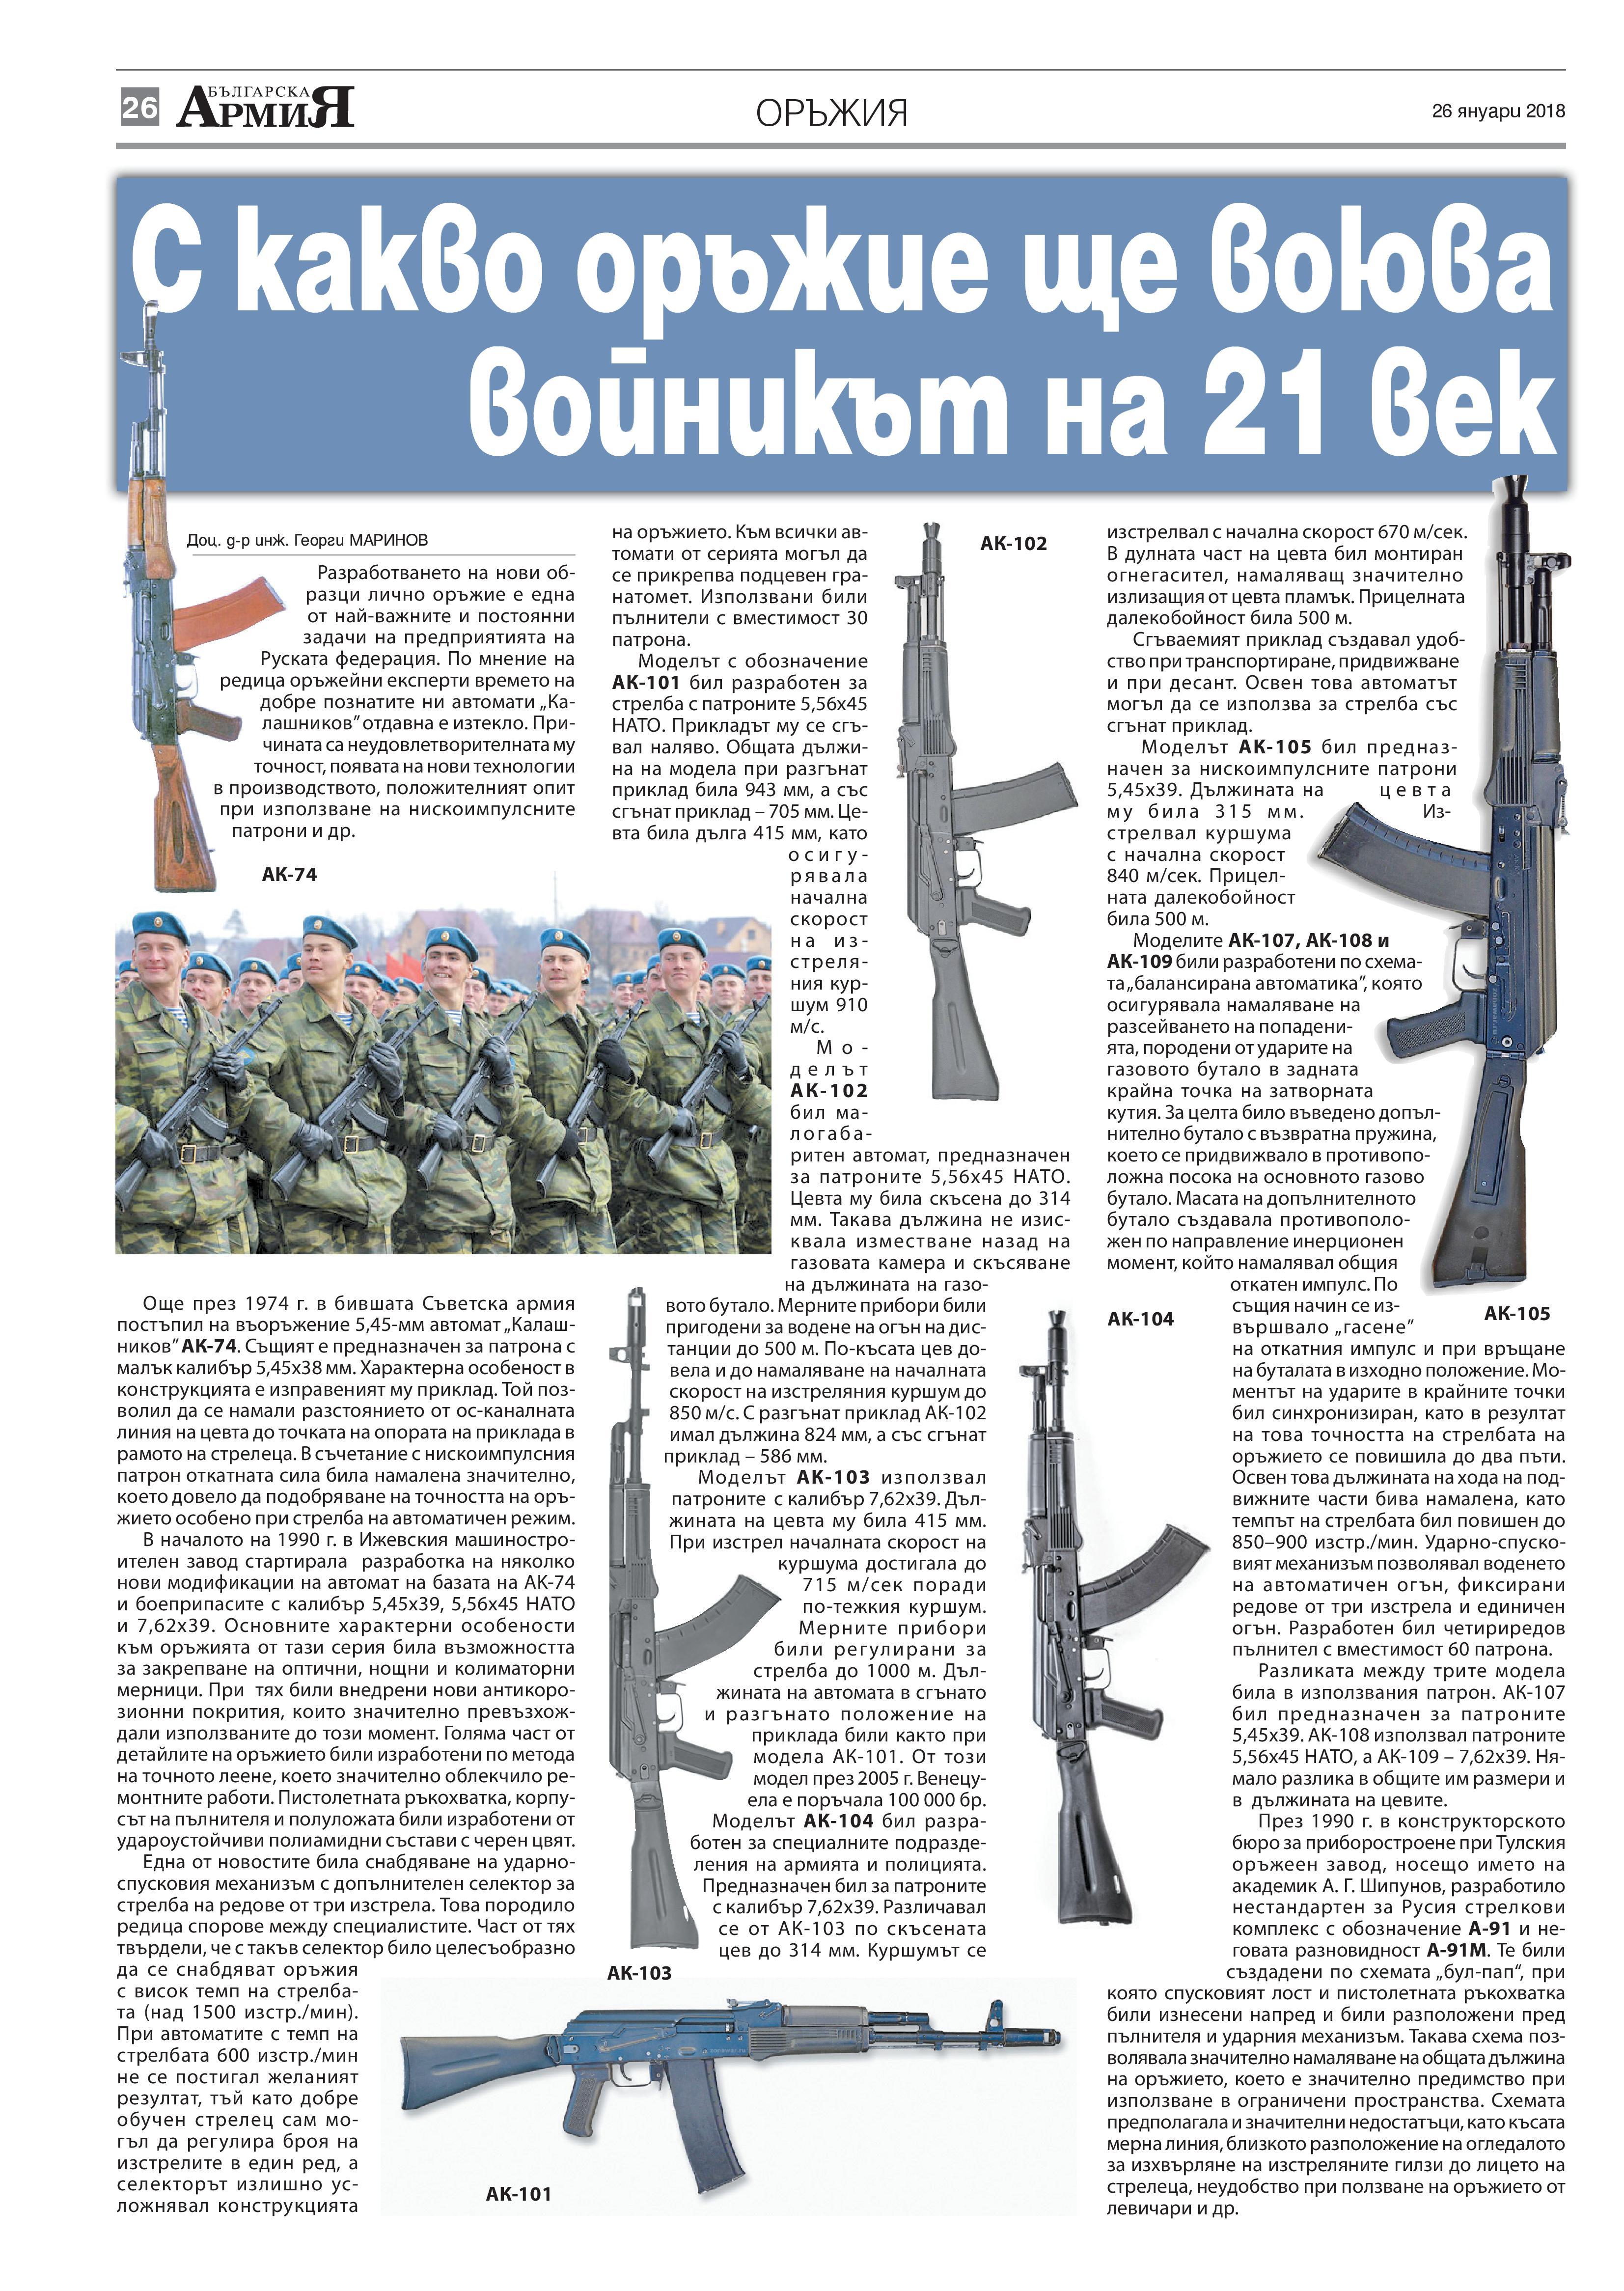 https://armymedia.bg/wp-content/uploads/2015/06/26-17.jpg